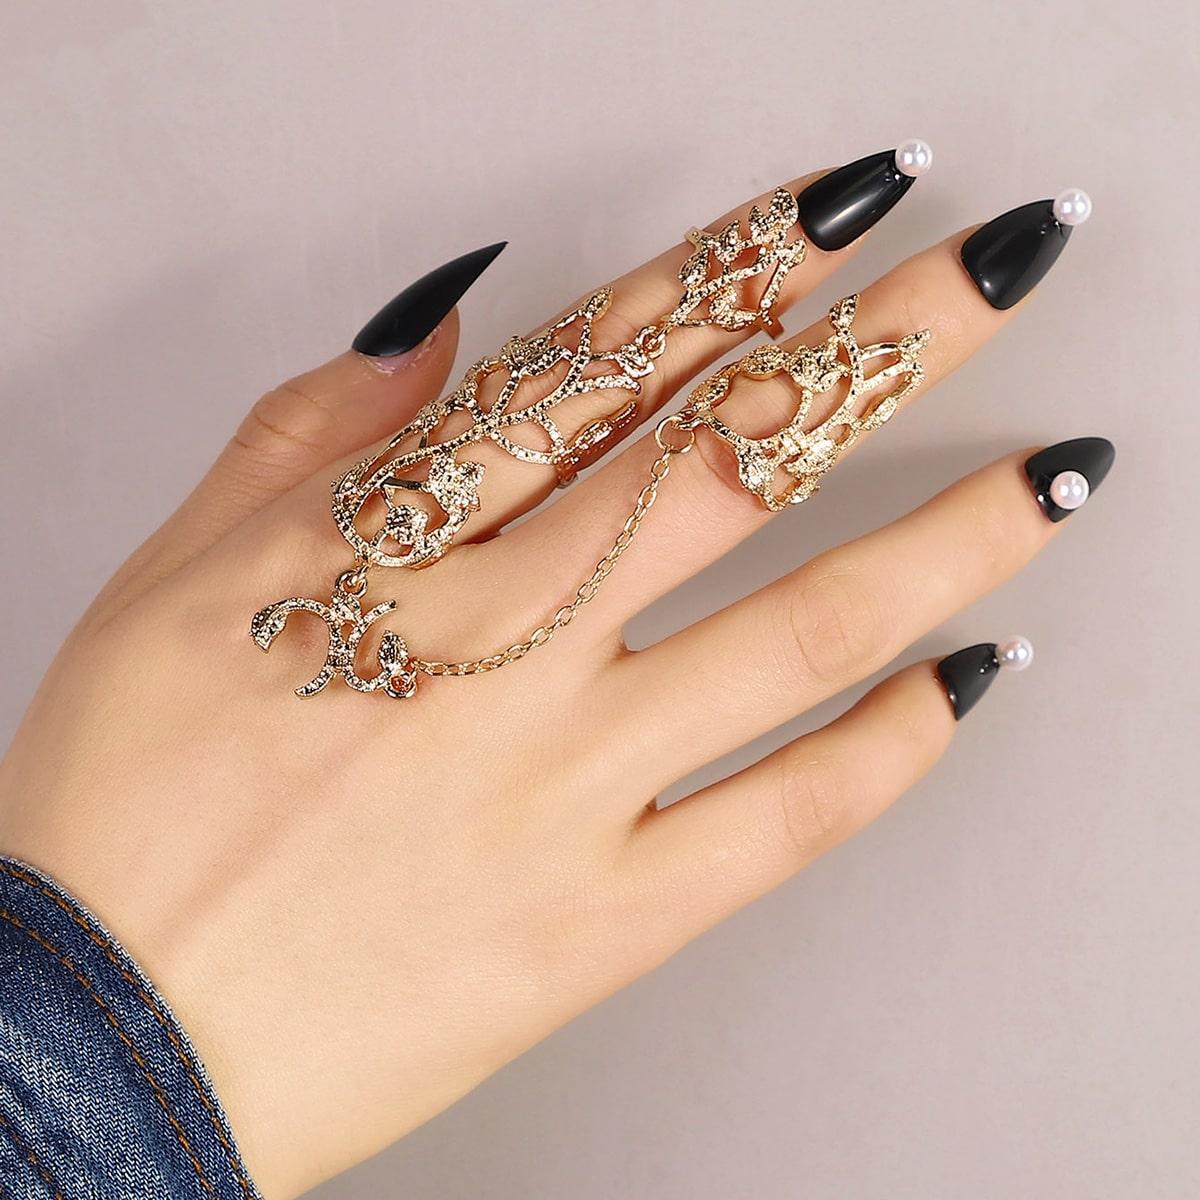 Кольцо варежки от SHEIN